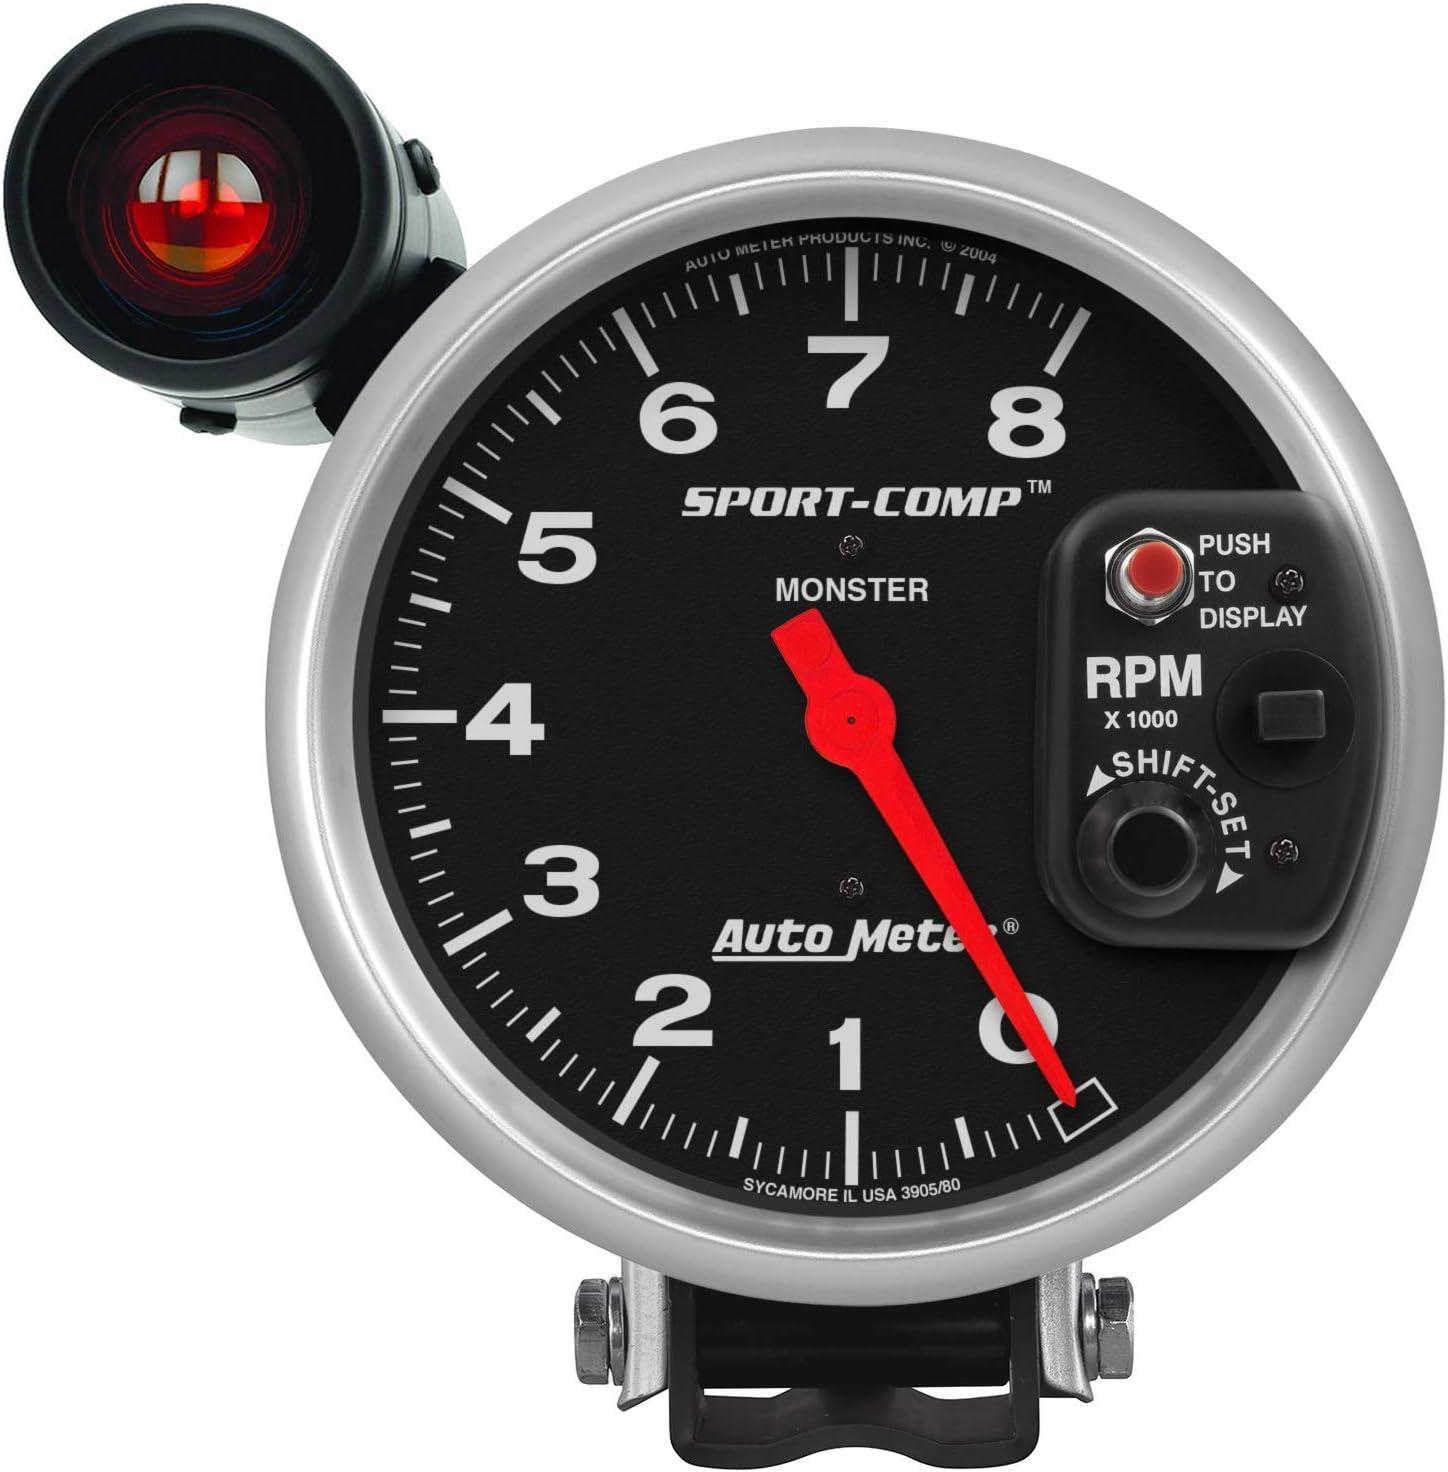 Auto Meter Tach Wiring To A 96 Camaro